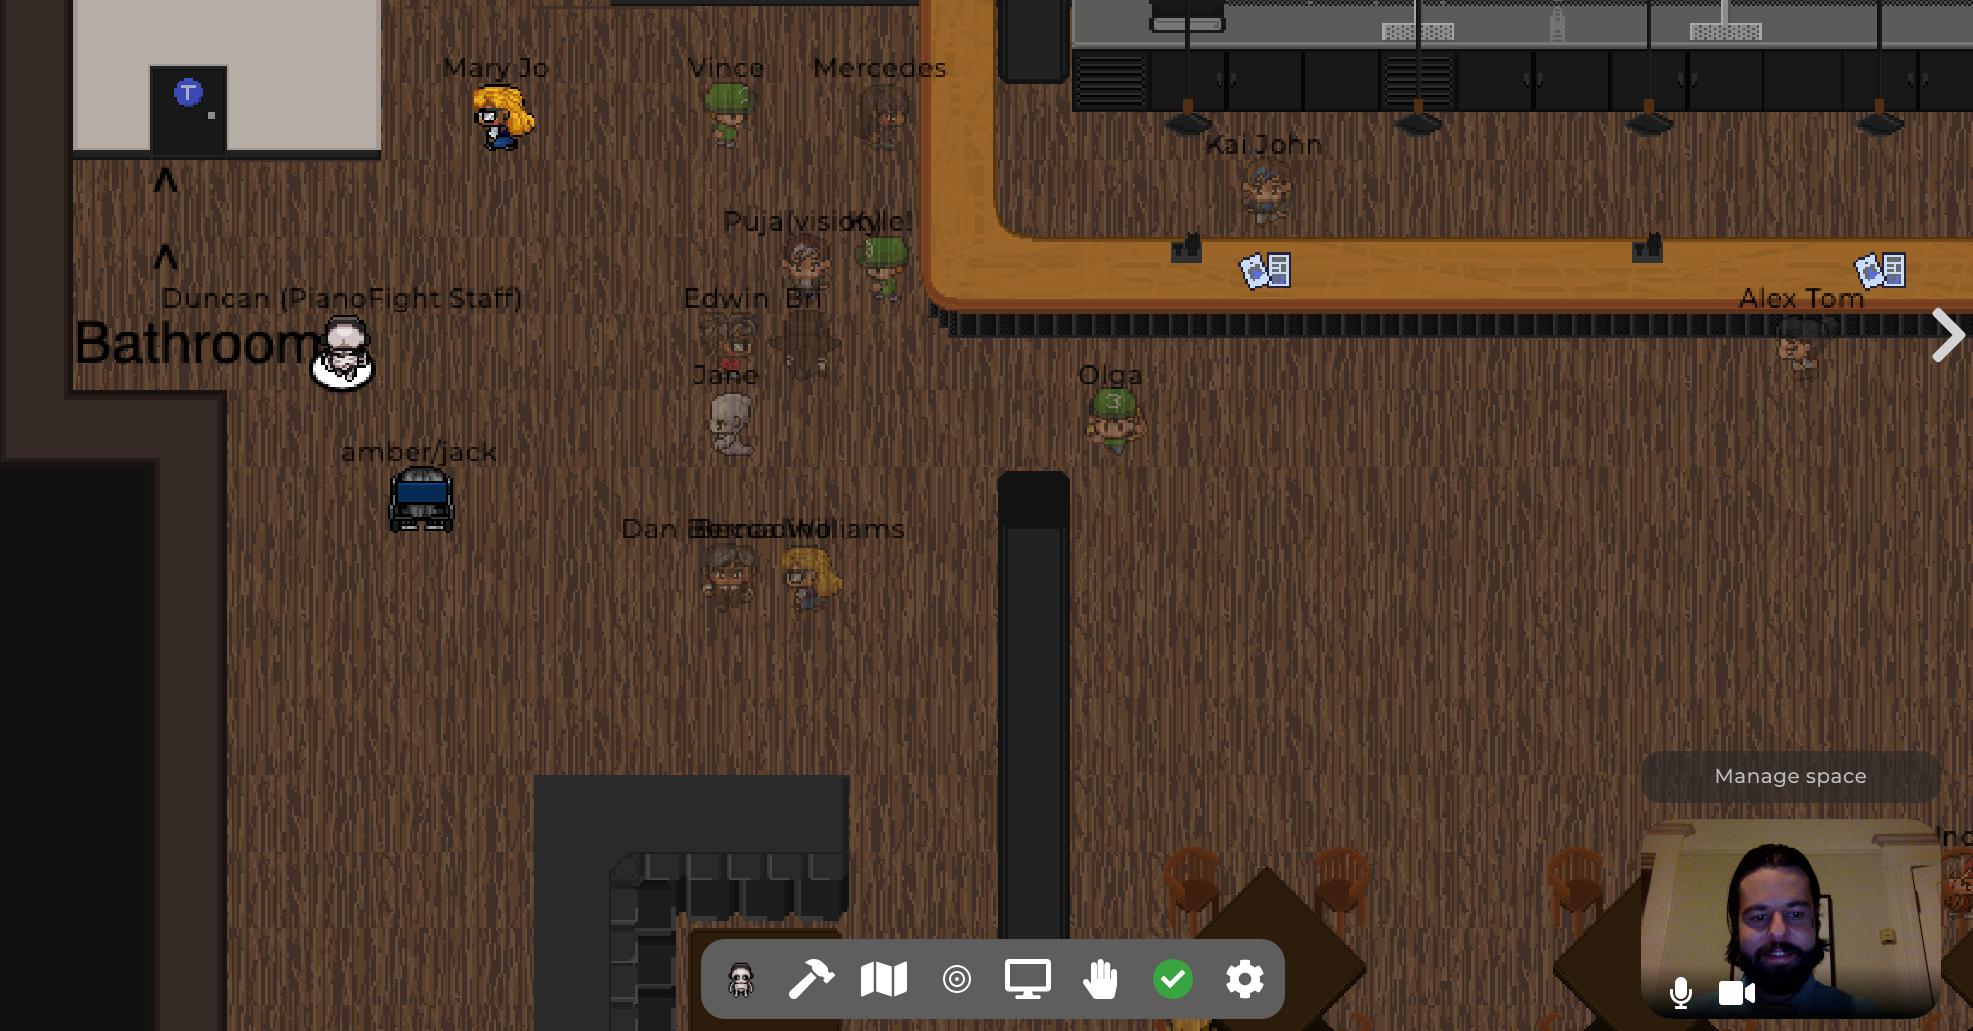 virtual venues, games